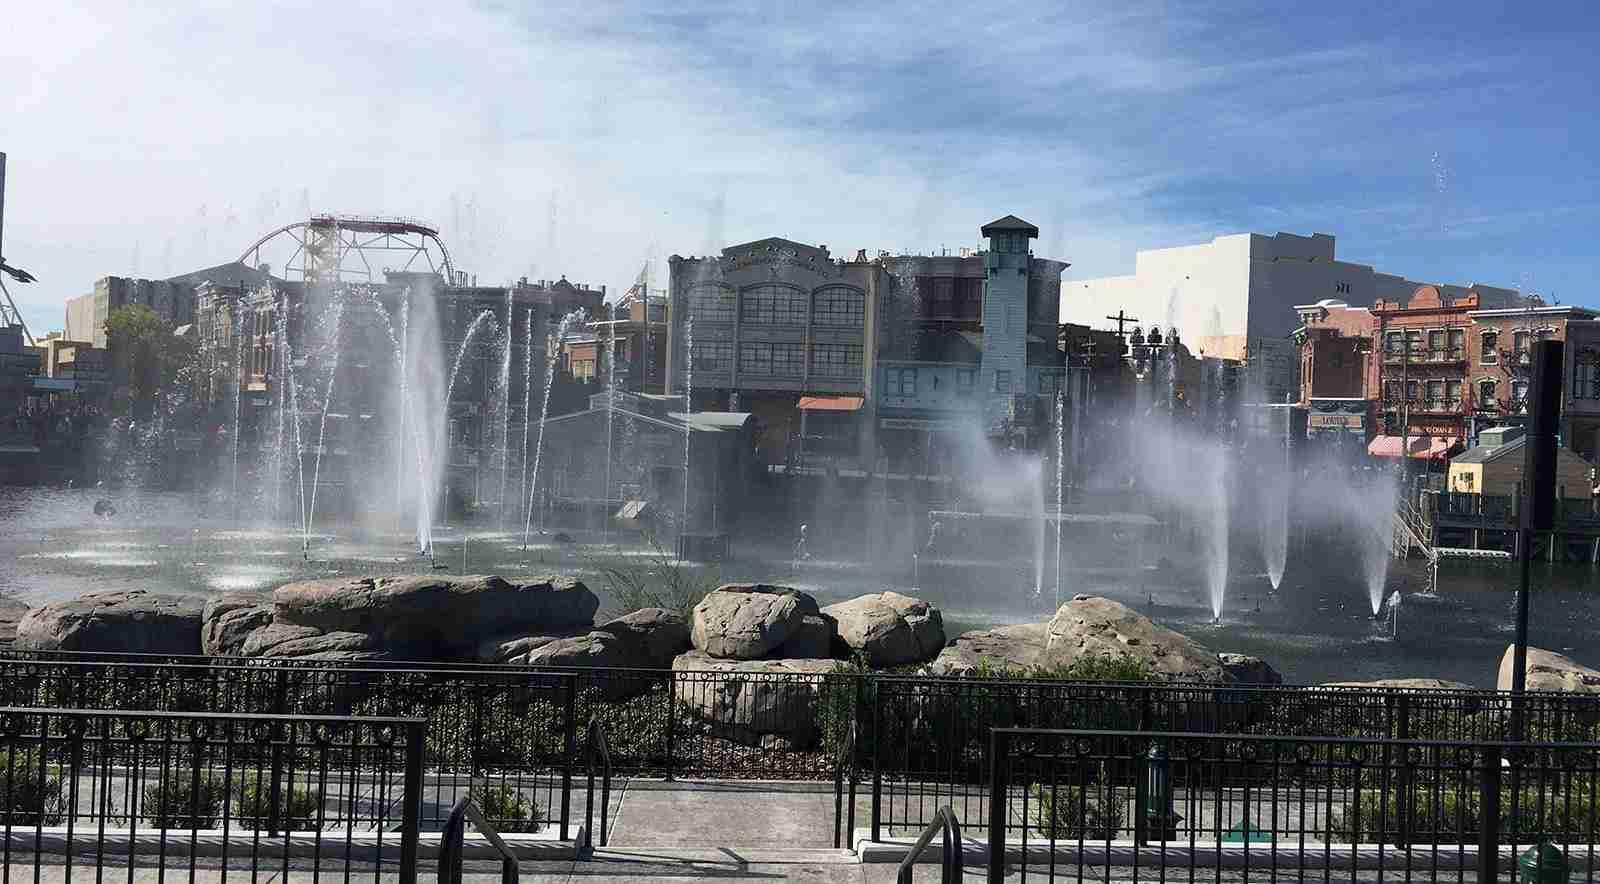 Universal Studios fountain show